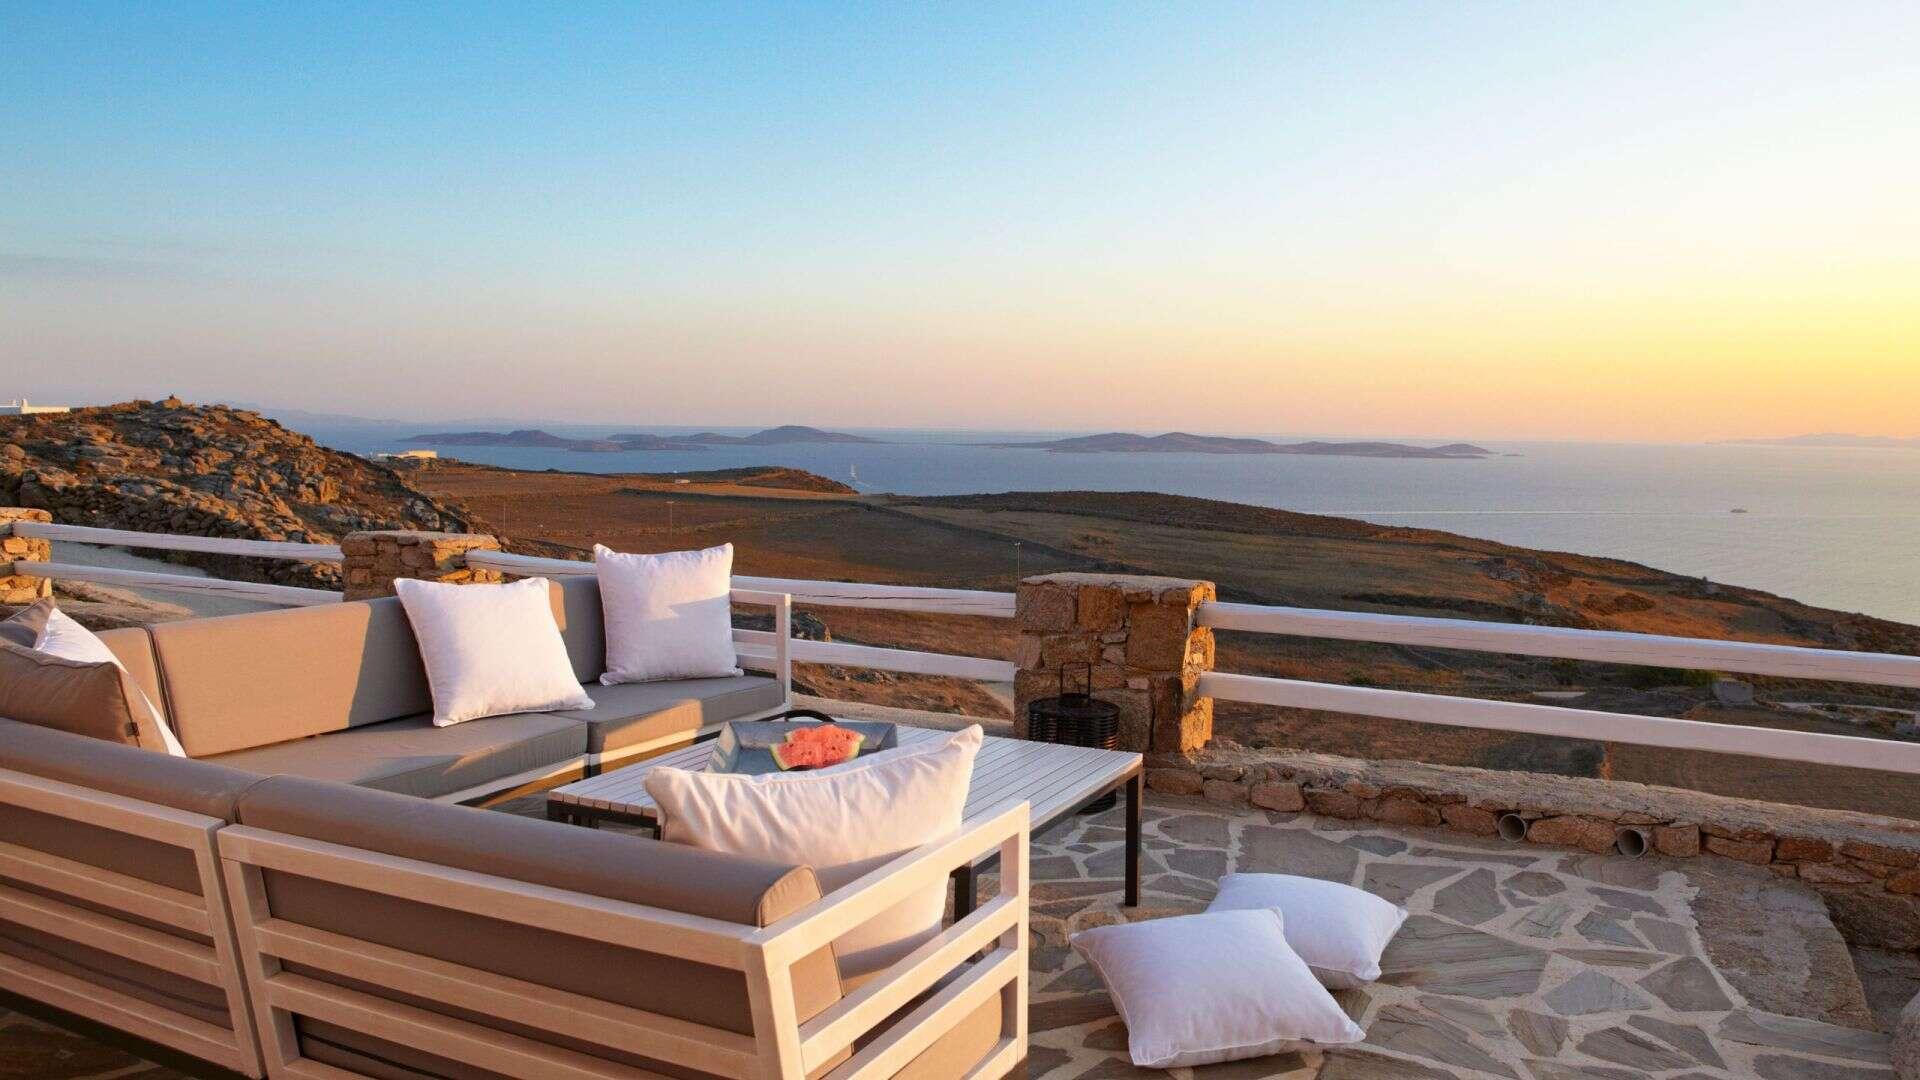 Luxury vacation rentals europe - Greece - Mykonos - Fanari - Stardust - Image 1/14